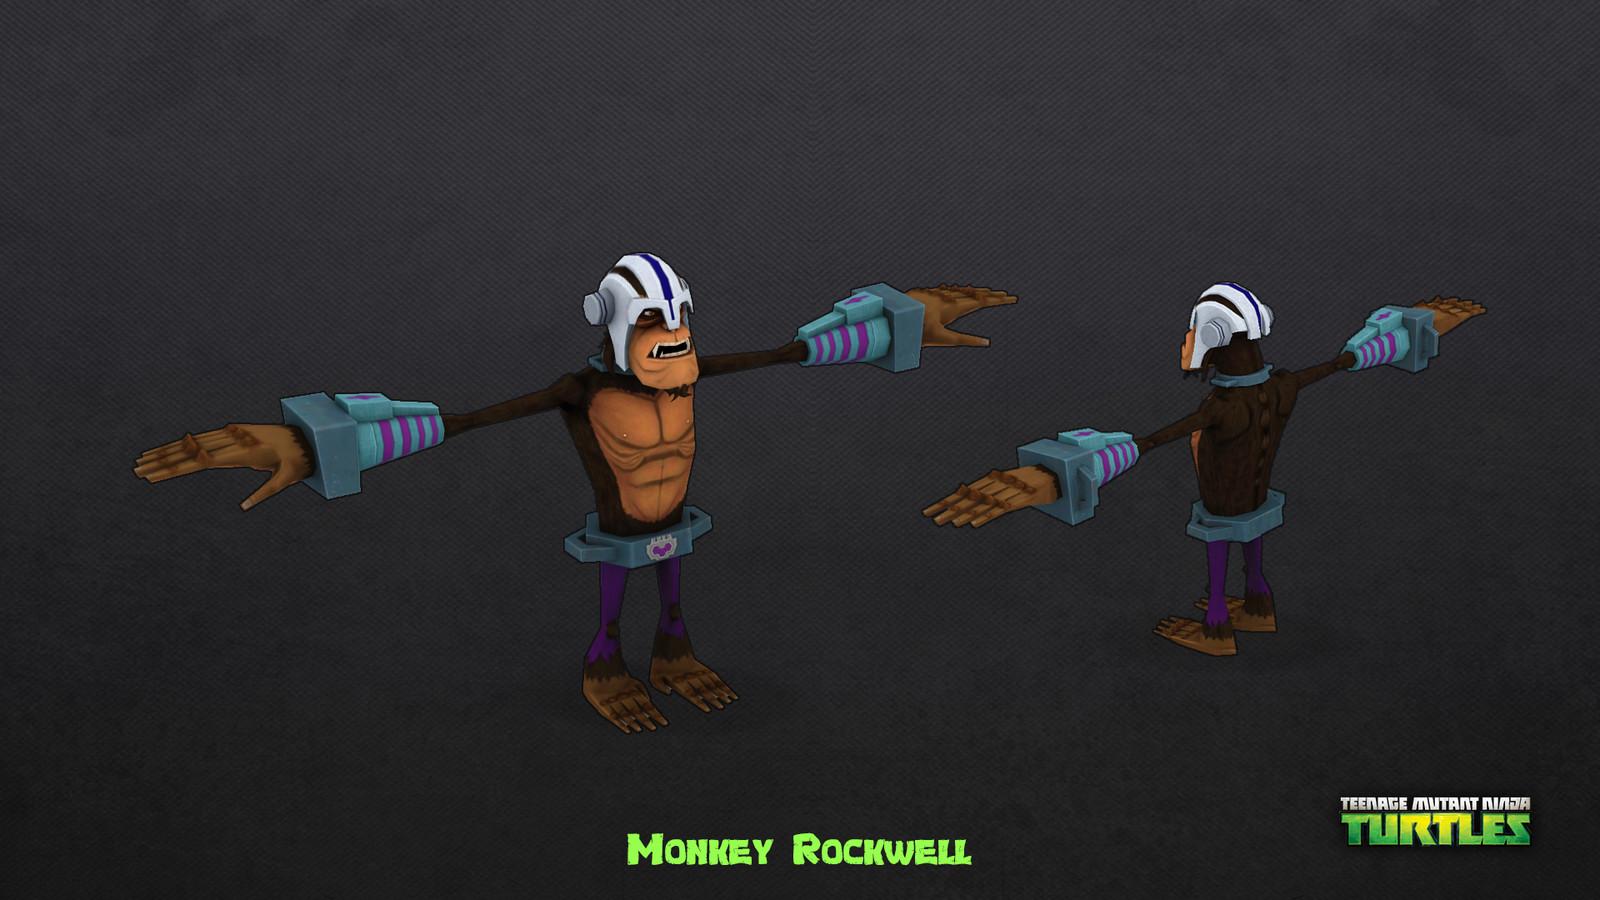 Monkey Rockwell